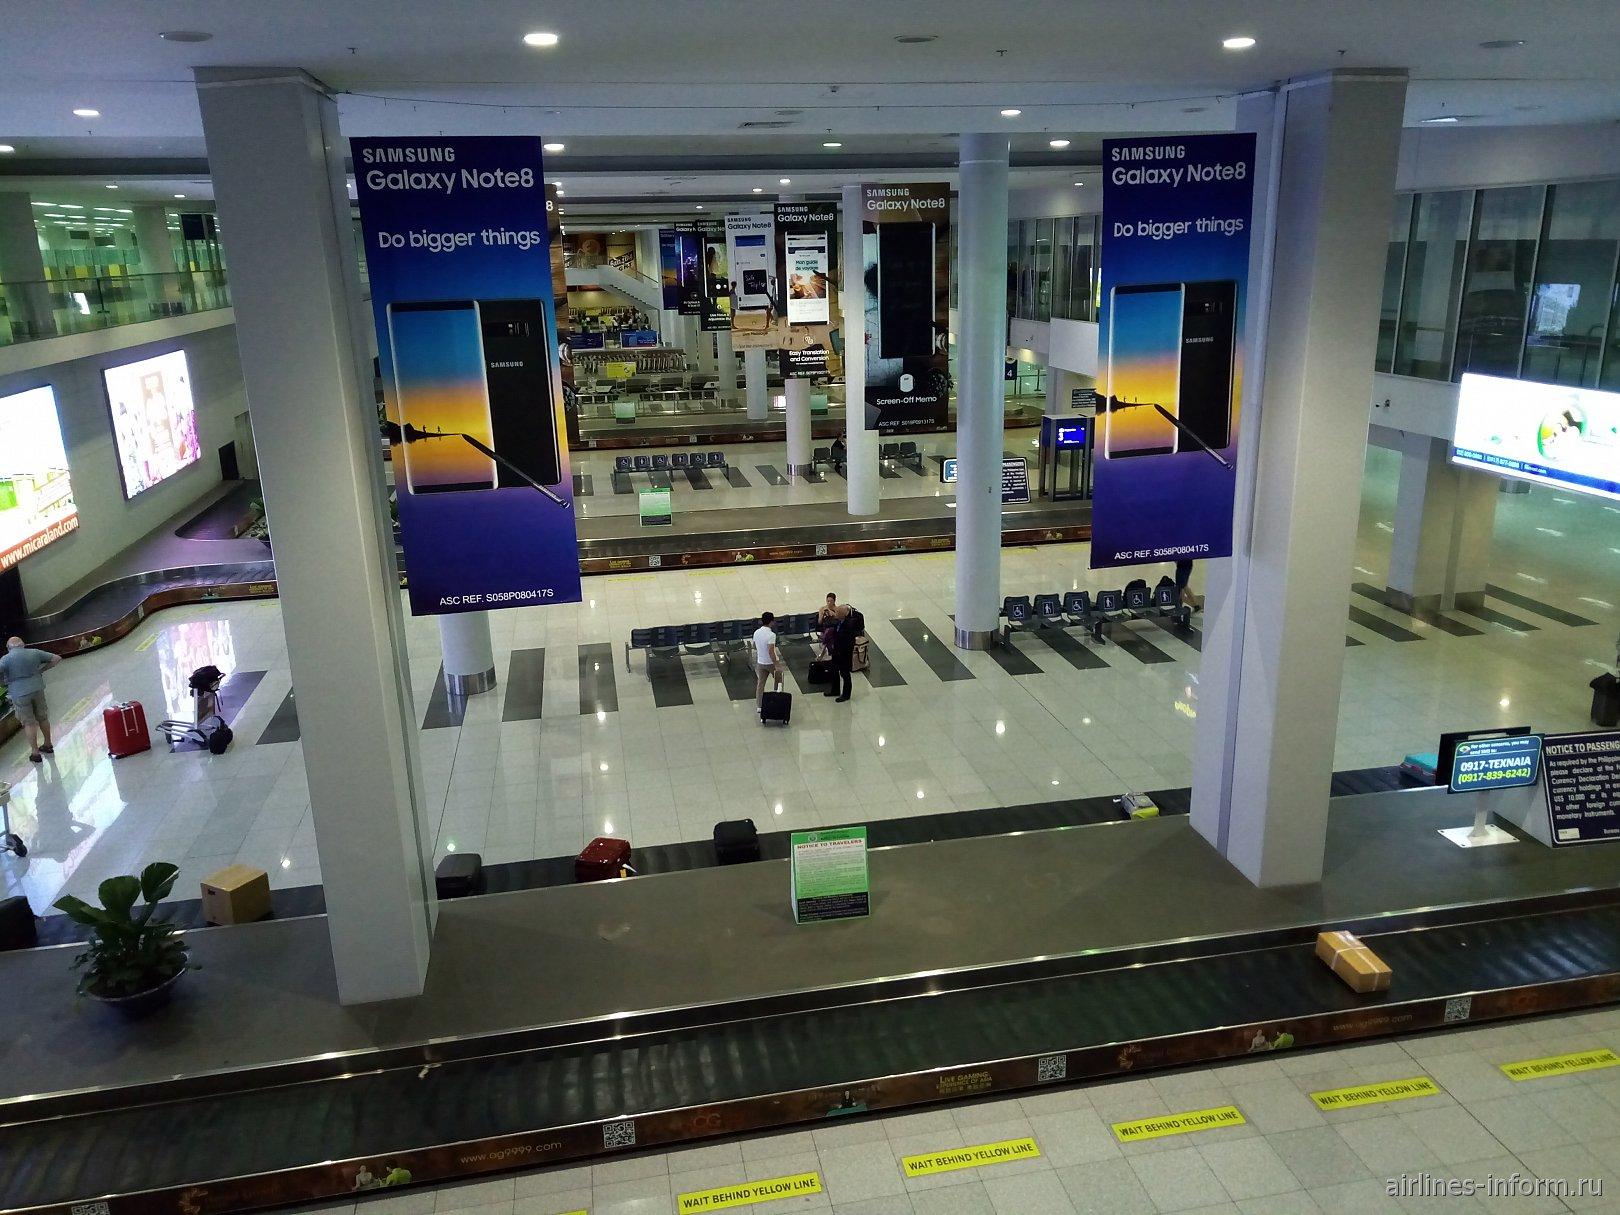 Зона выдачи багажа в аэропорту Манила Ниной Акуино